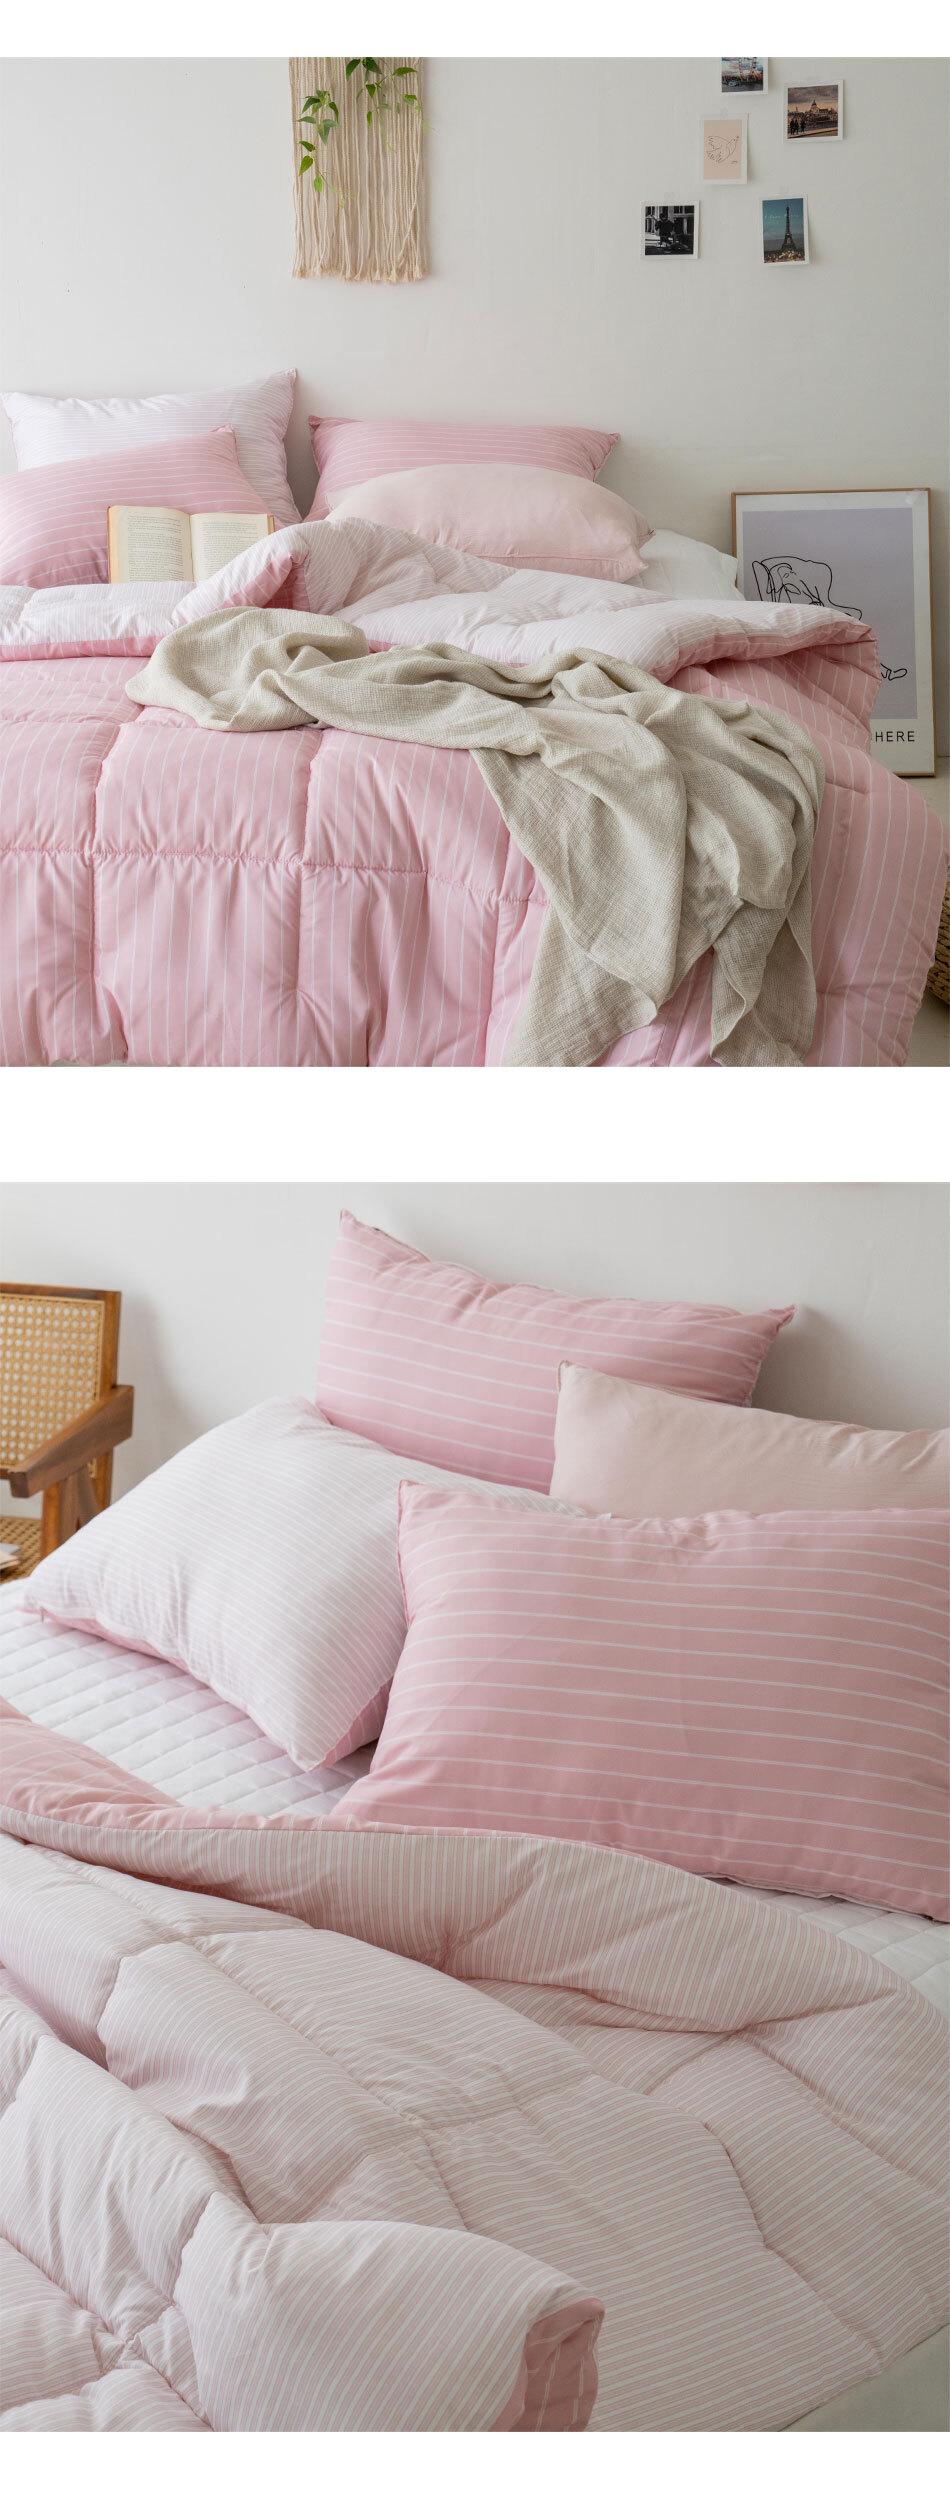 urban_bed_pink_02.jpg